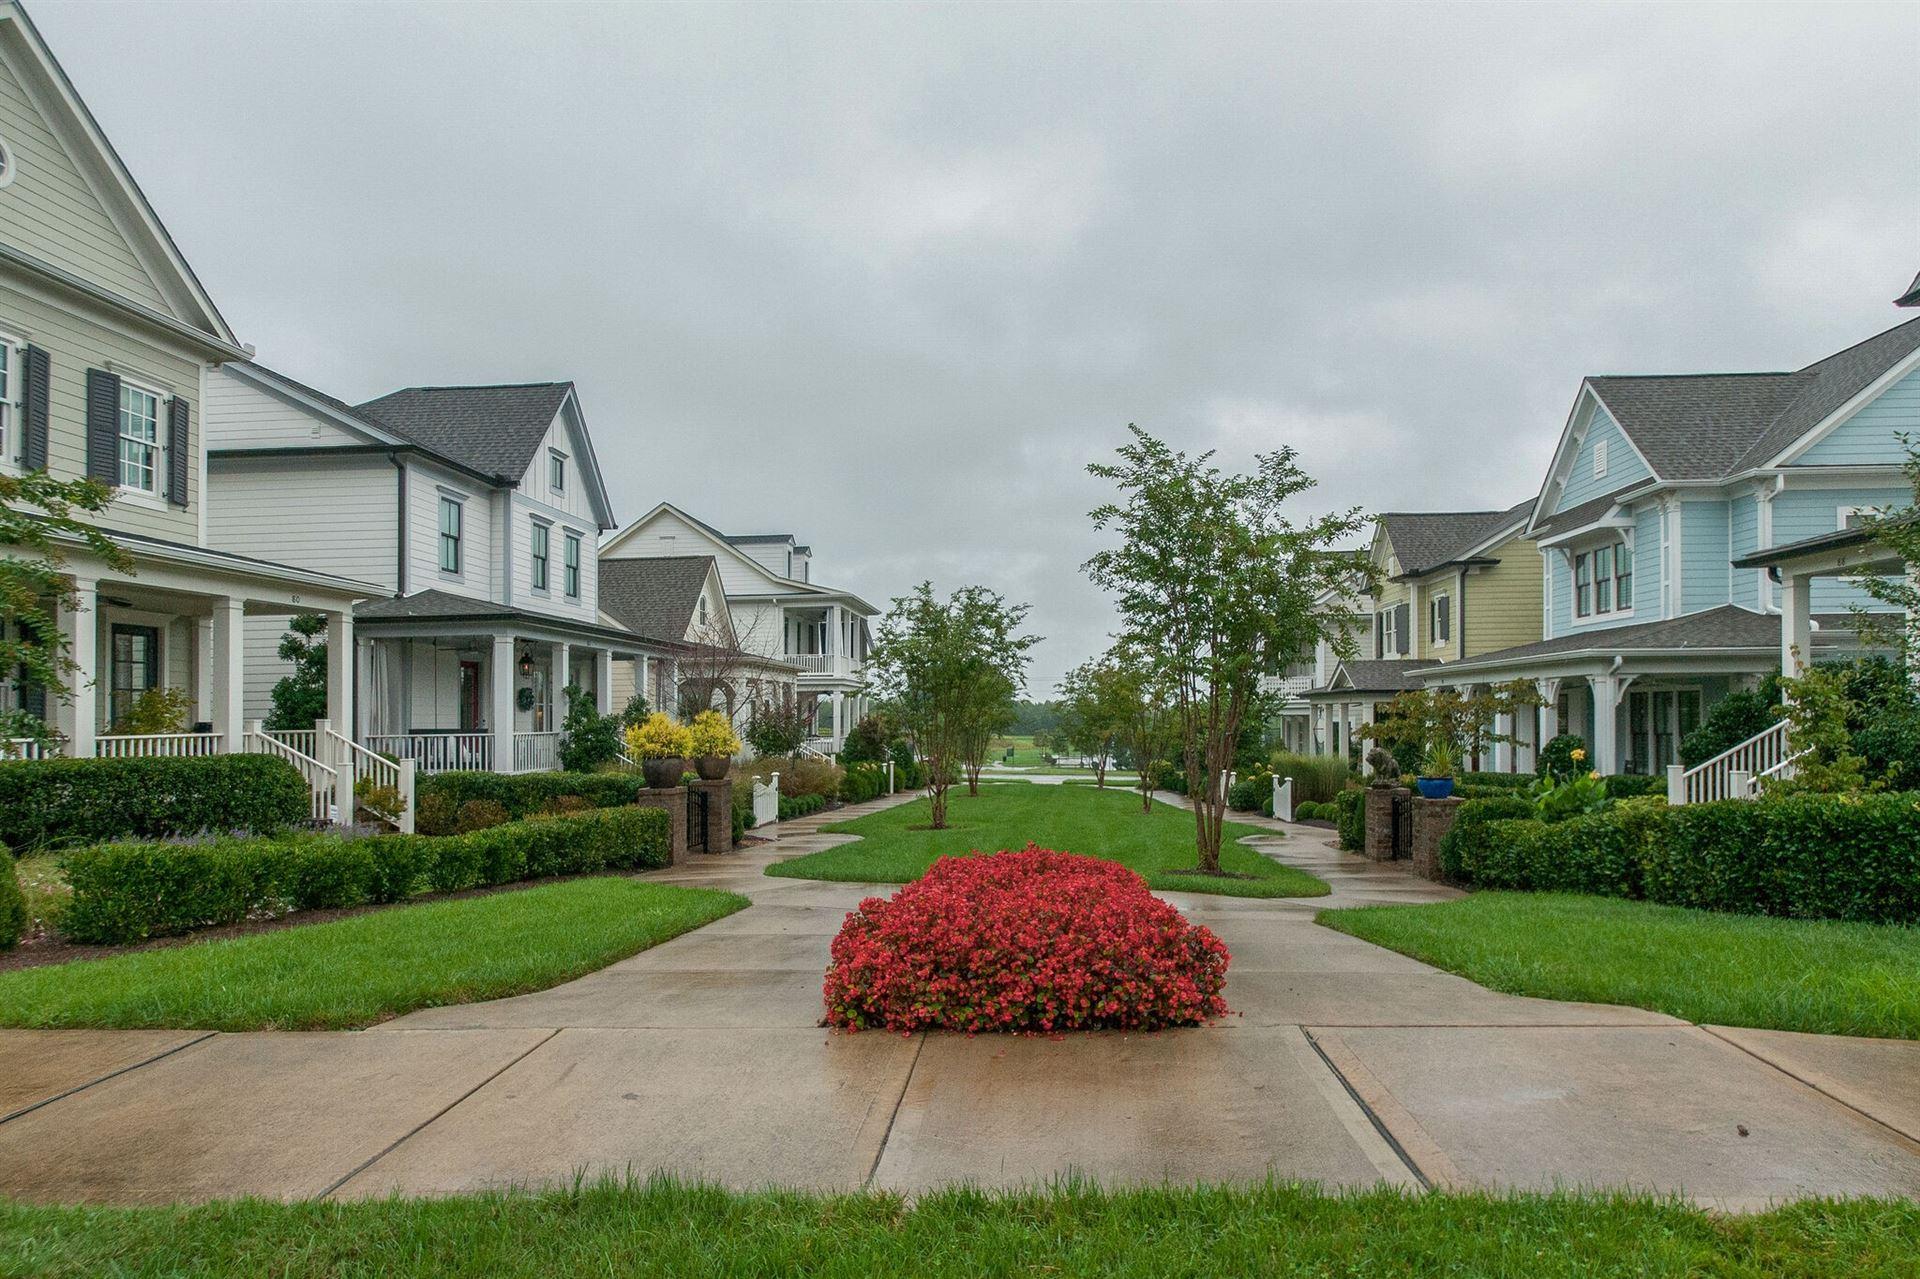 Photo of 90 Addison Ave, Franklin, TN 37064 (MLS # 2293099)